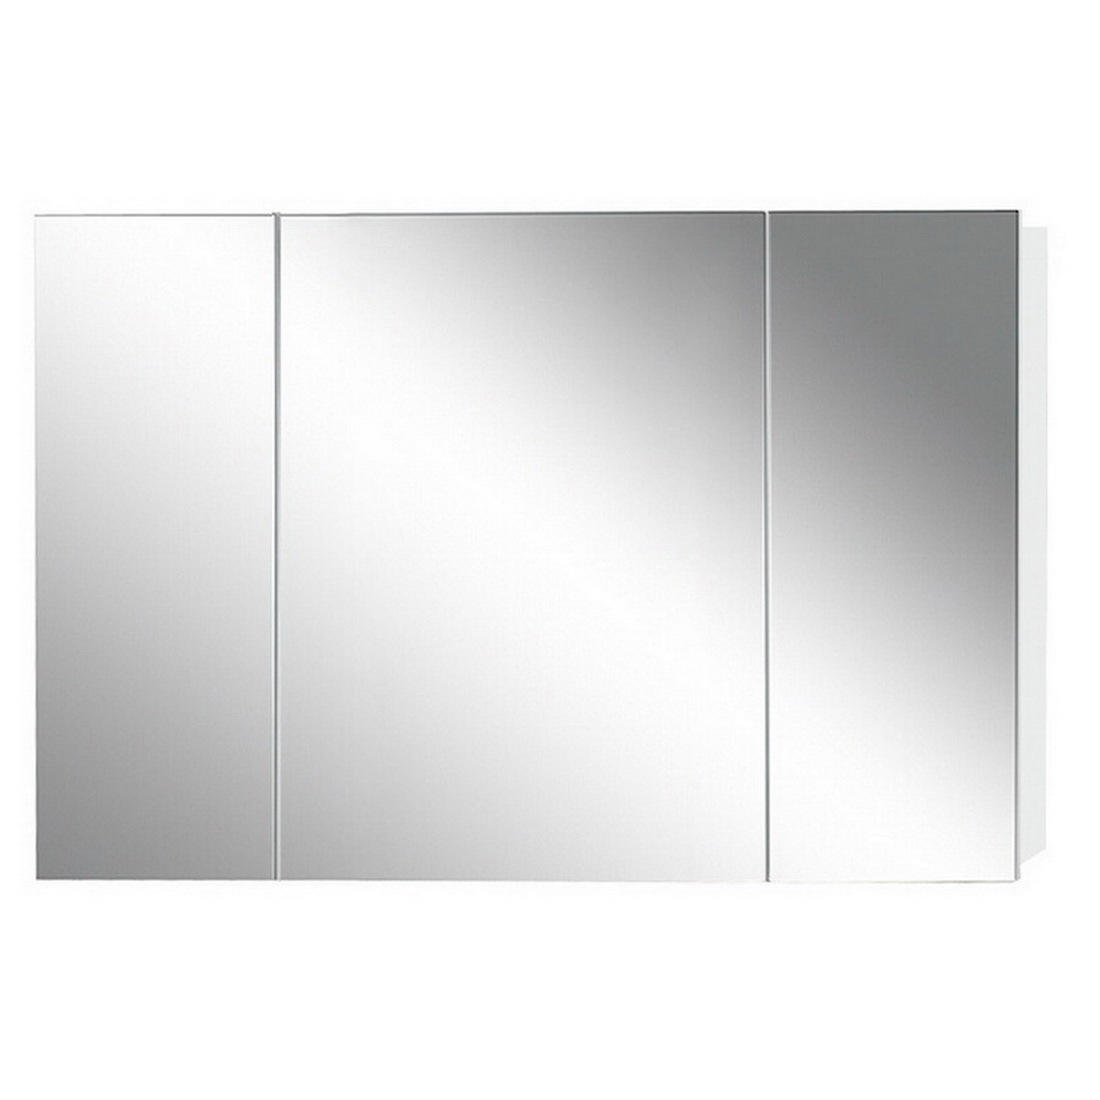 Newtech Avon Mirror Cabinet 800 x 1200 mm Gloss White 3 Doors 5030